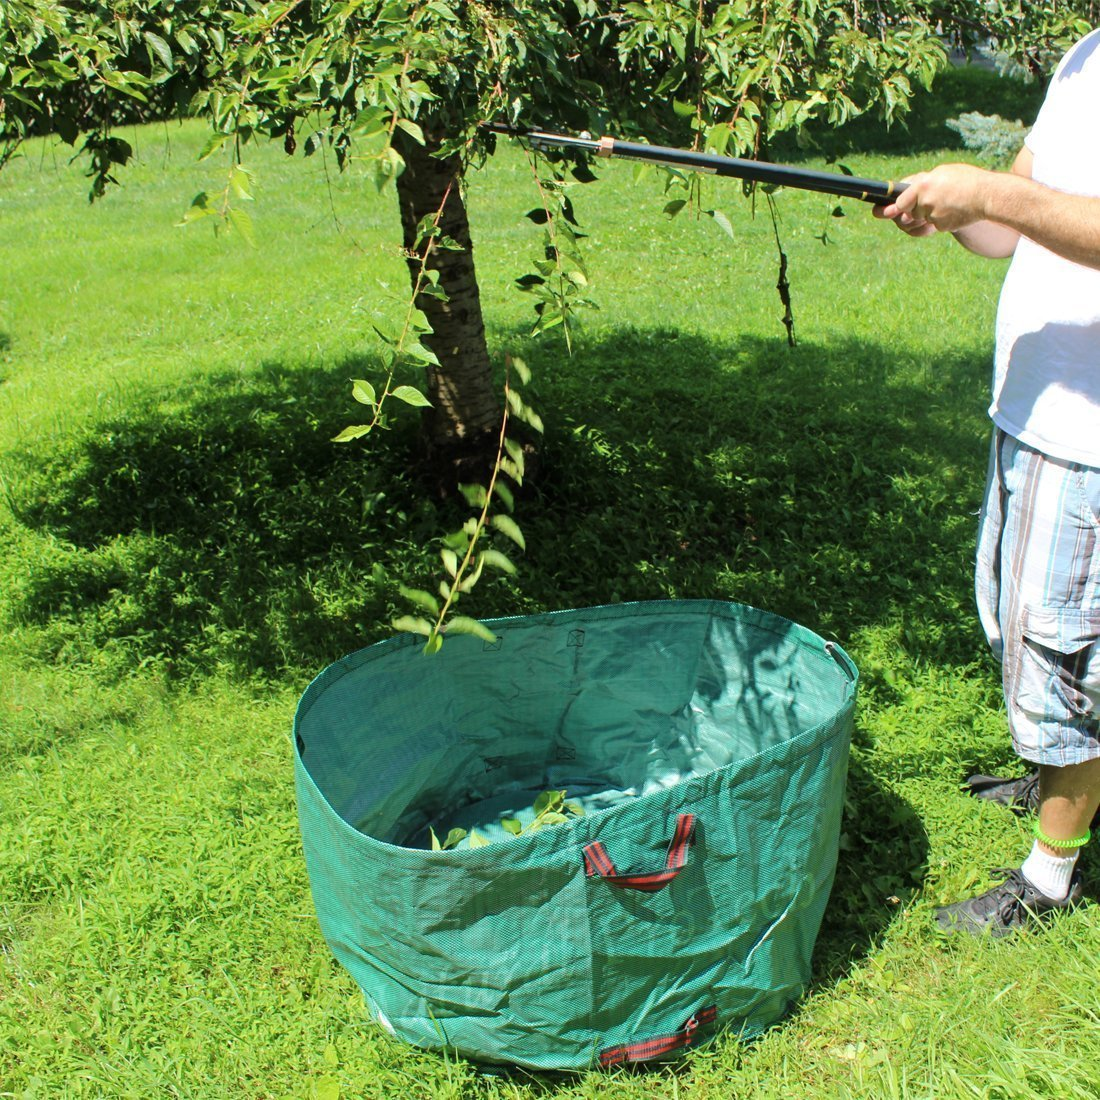 SUNWIN Lawn and Leaf Bags Garden Reusable Leaf Bag Yard Lawn Gardening Waste Bag 63 Gallons by Sunwin (Image #1)